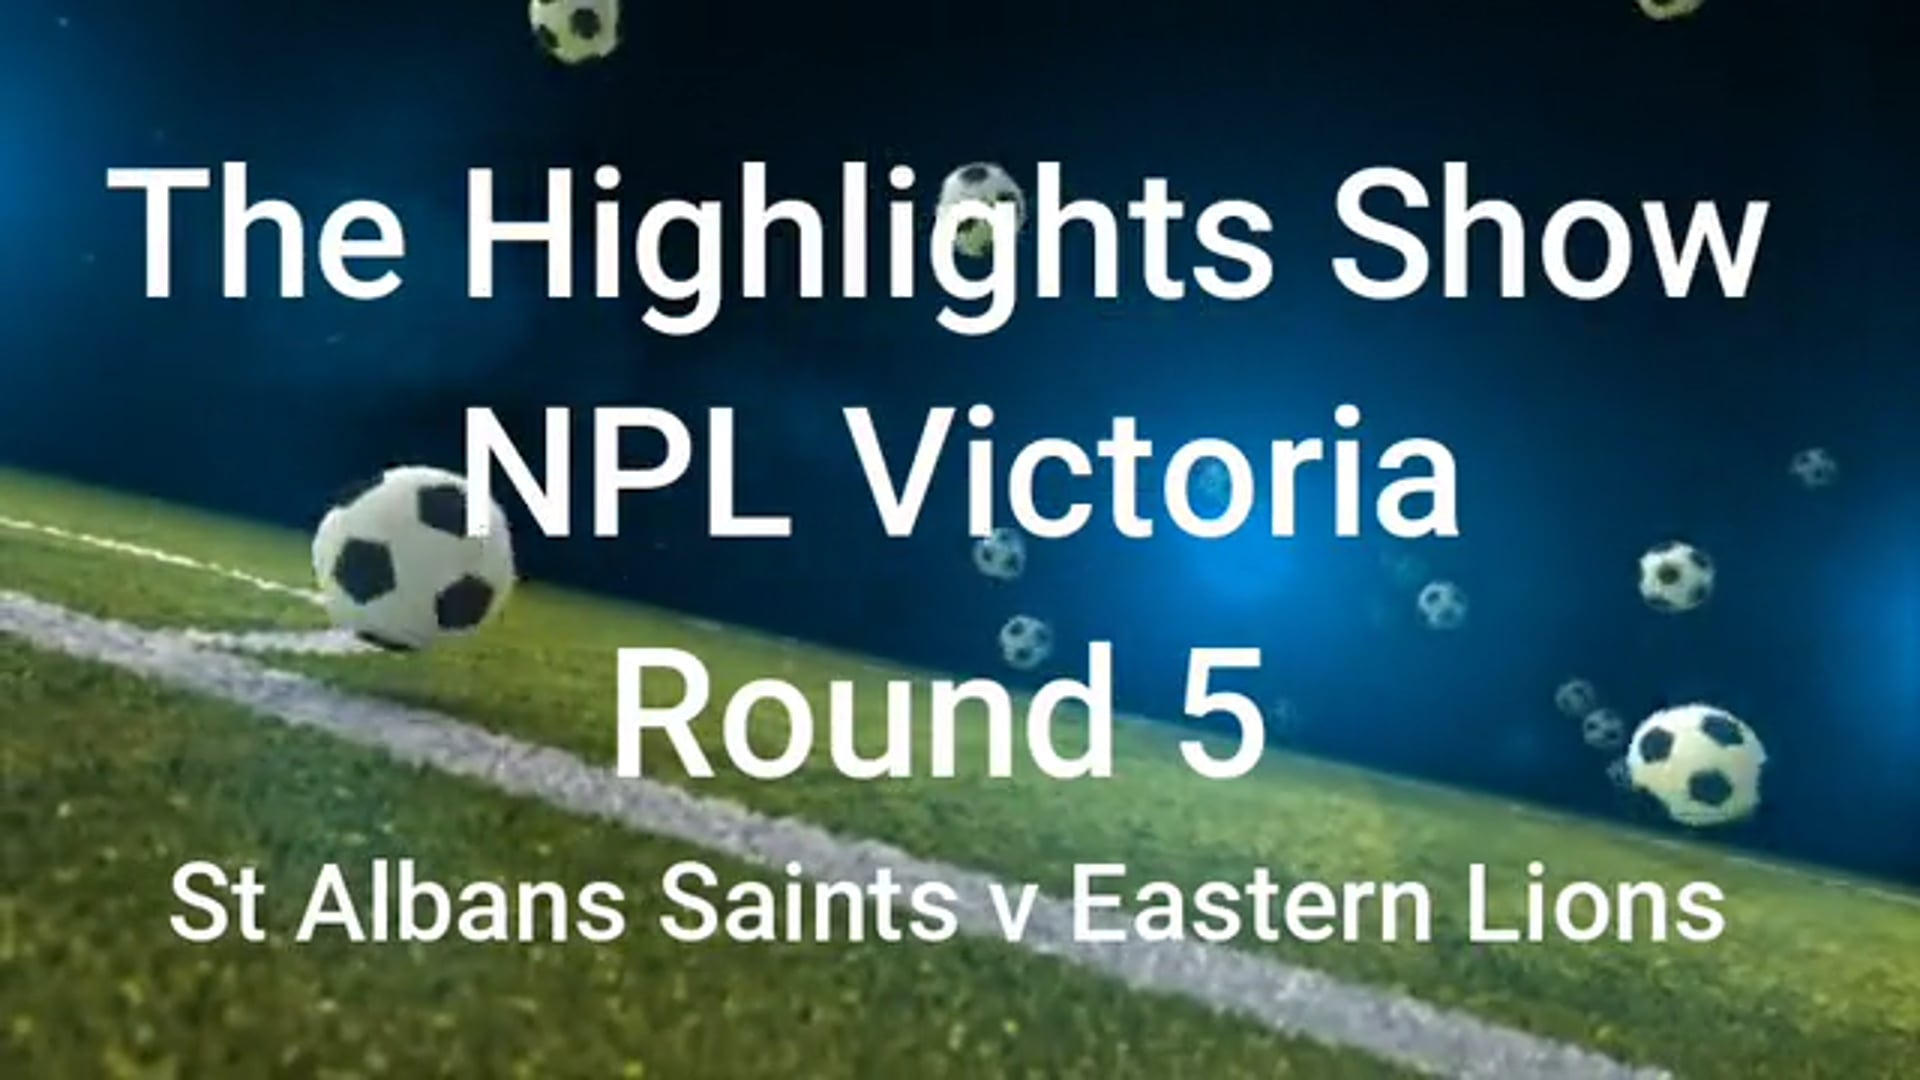 NPL Vic rd 5 St Albans Saints v Eastern Lions highlights